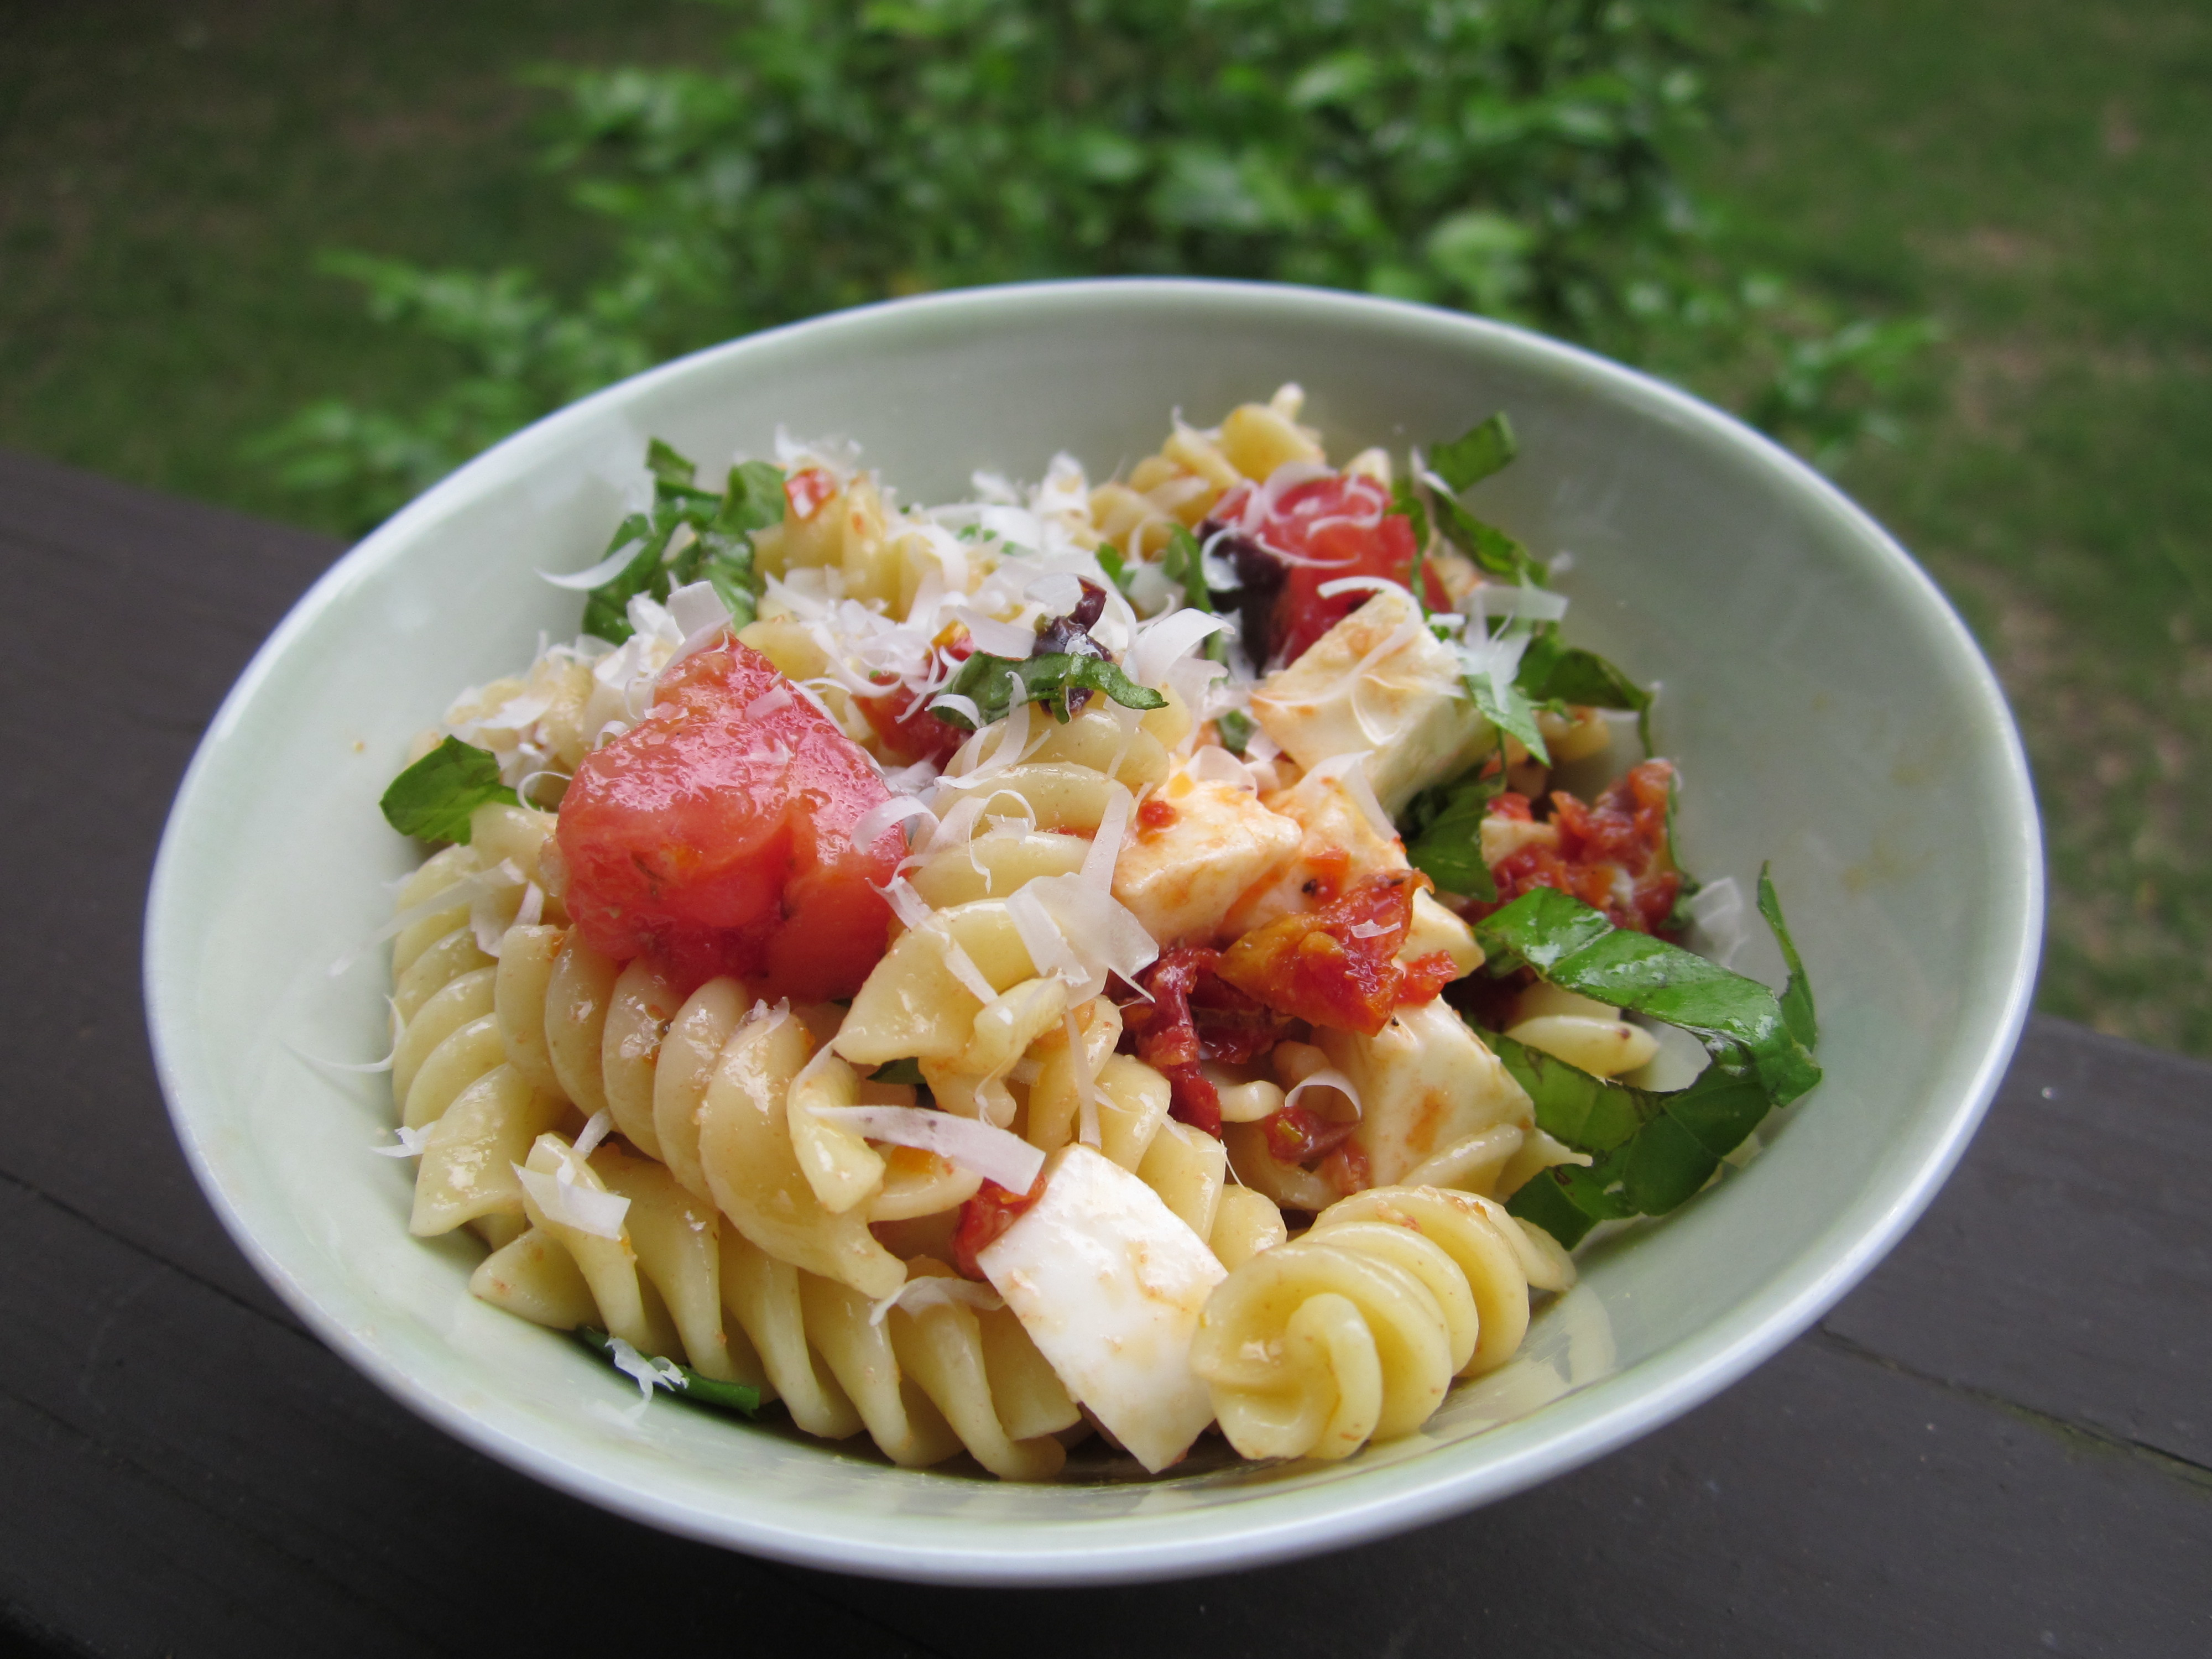 ... sun dried tomato feta pasta salad a sunshiny day sundried tomato pasta